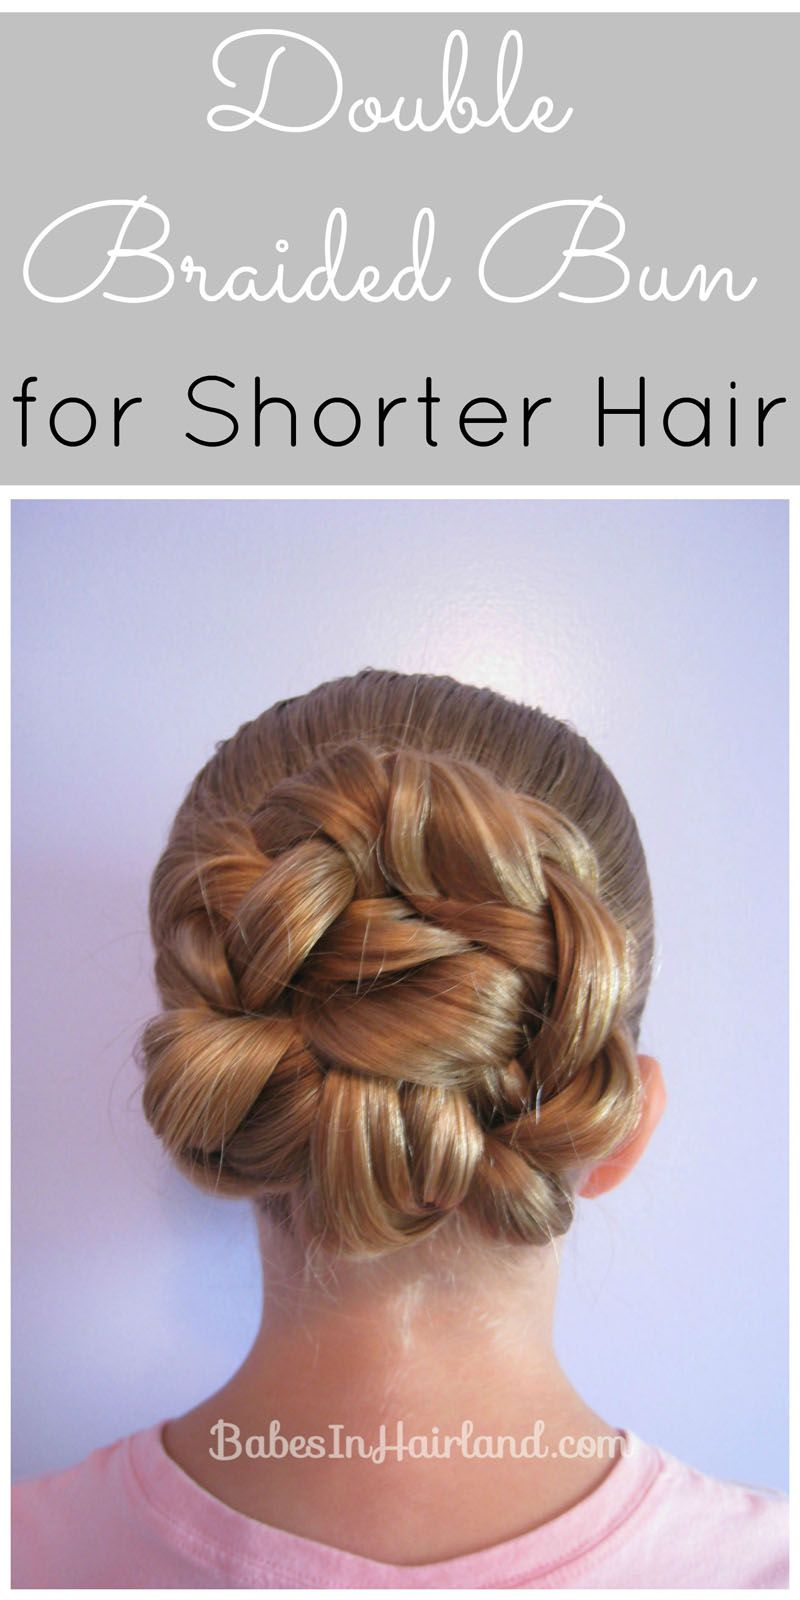 Double Braided Bun for Shorter Hair   Family Ideas Galore